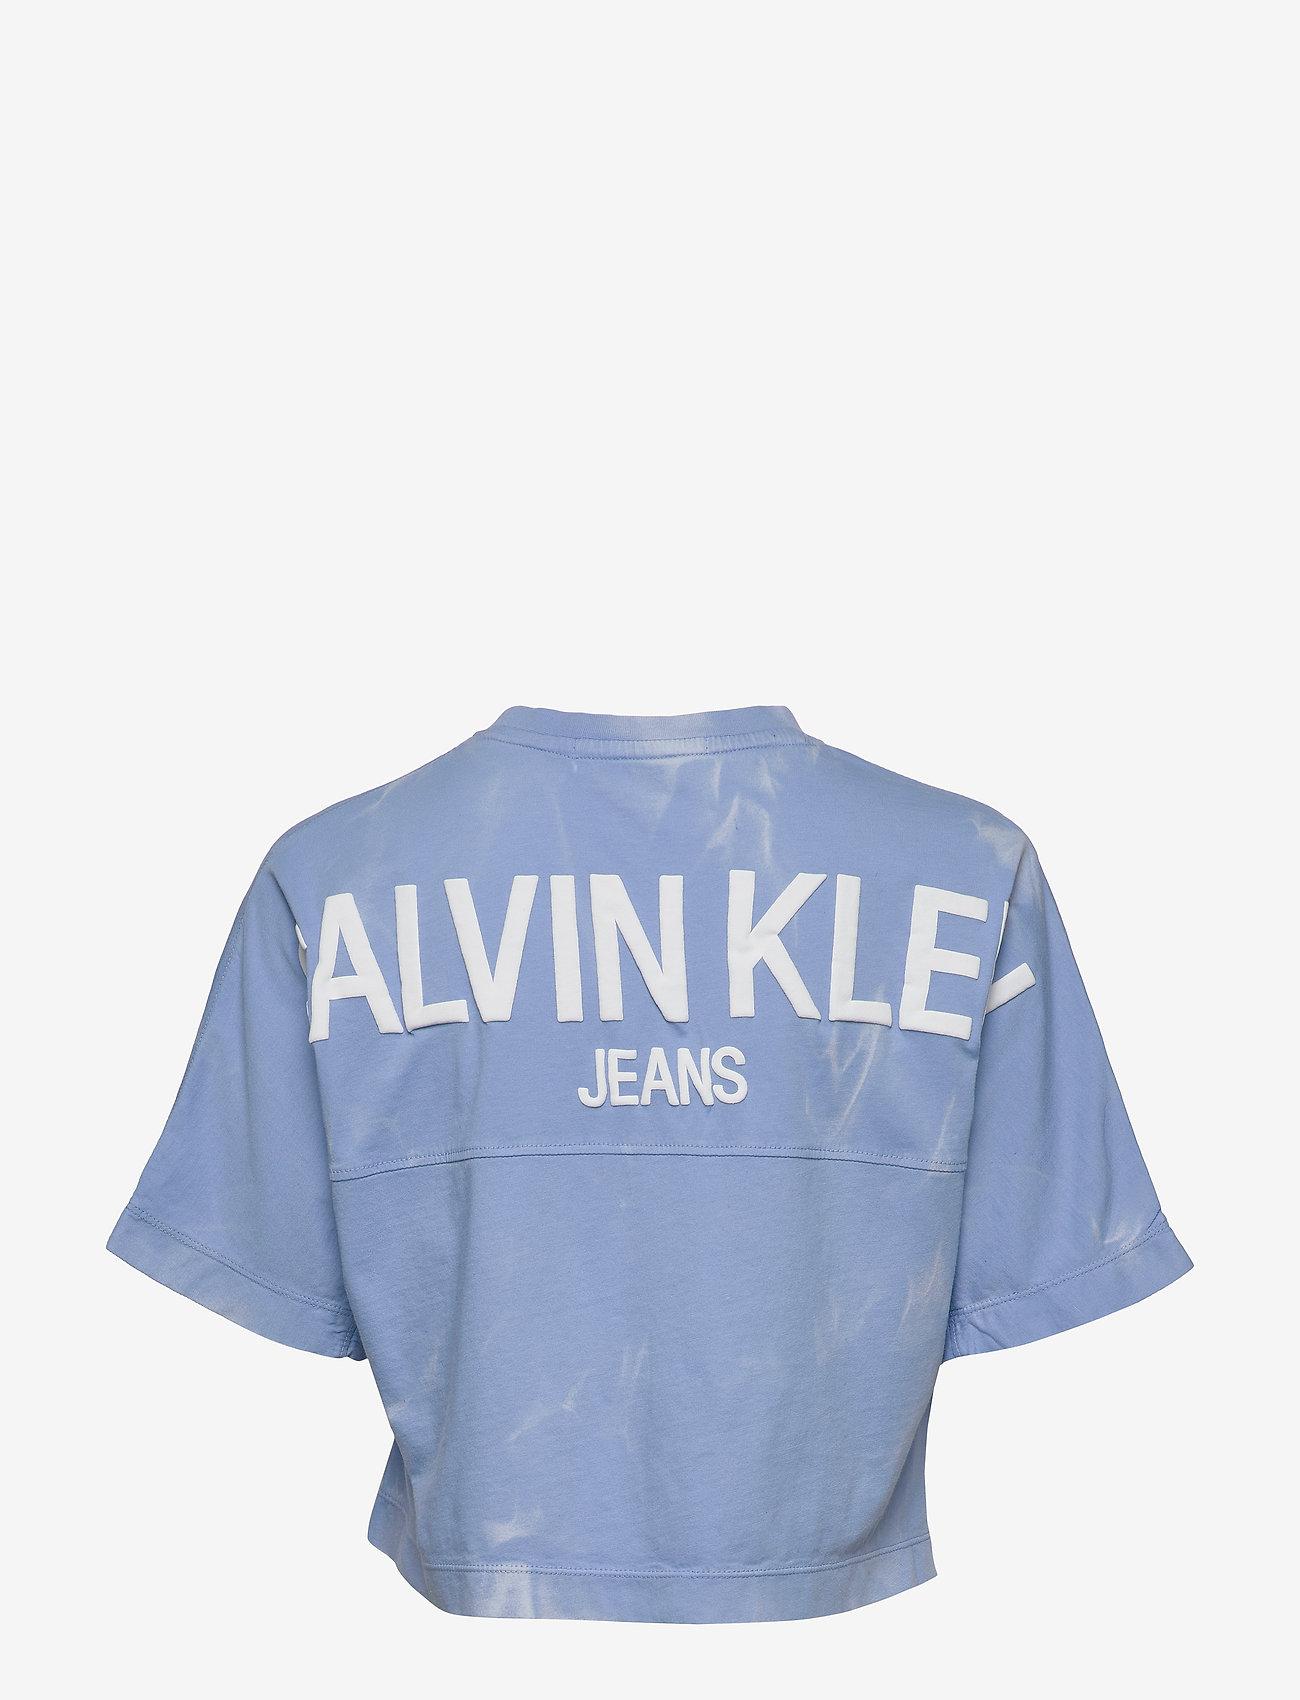 Calvin Klein Jeans - LAVA DYE CROPPED TEE - crop tops - powdery blue - 1